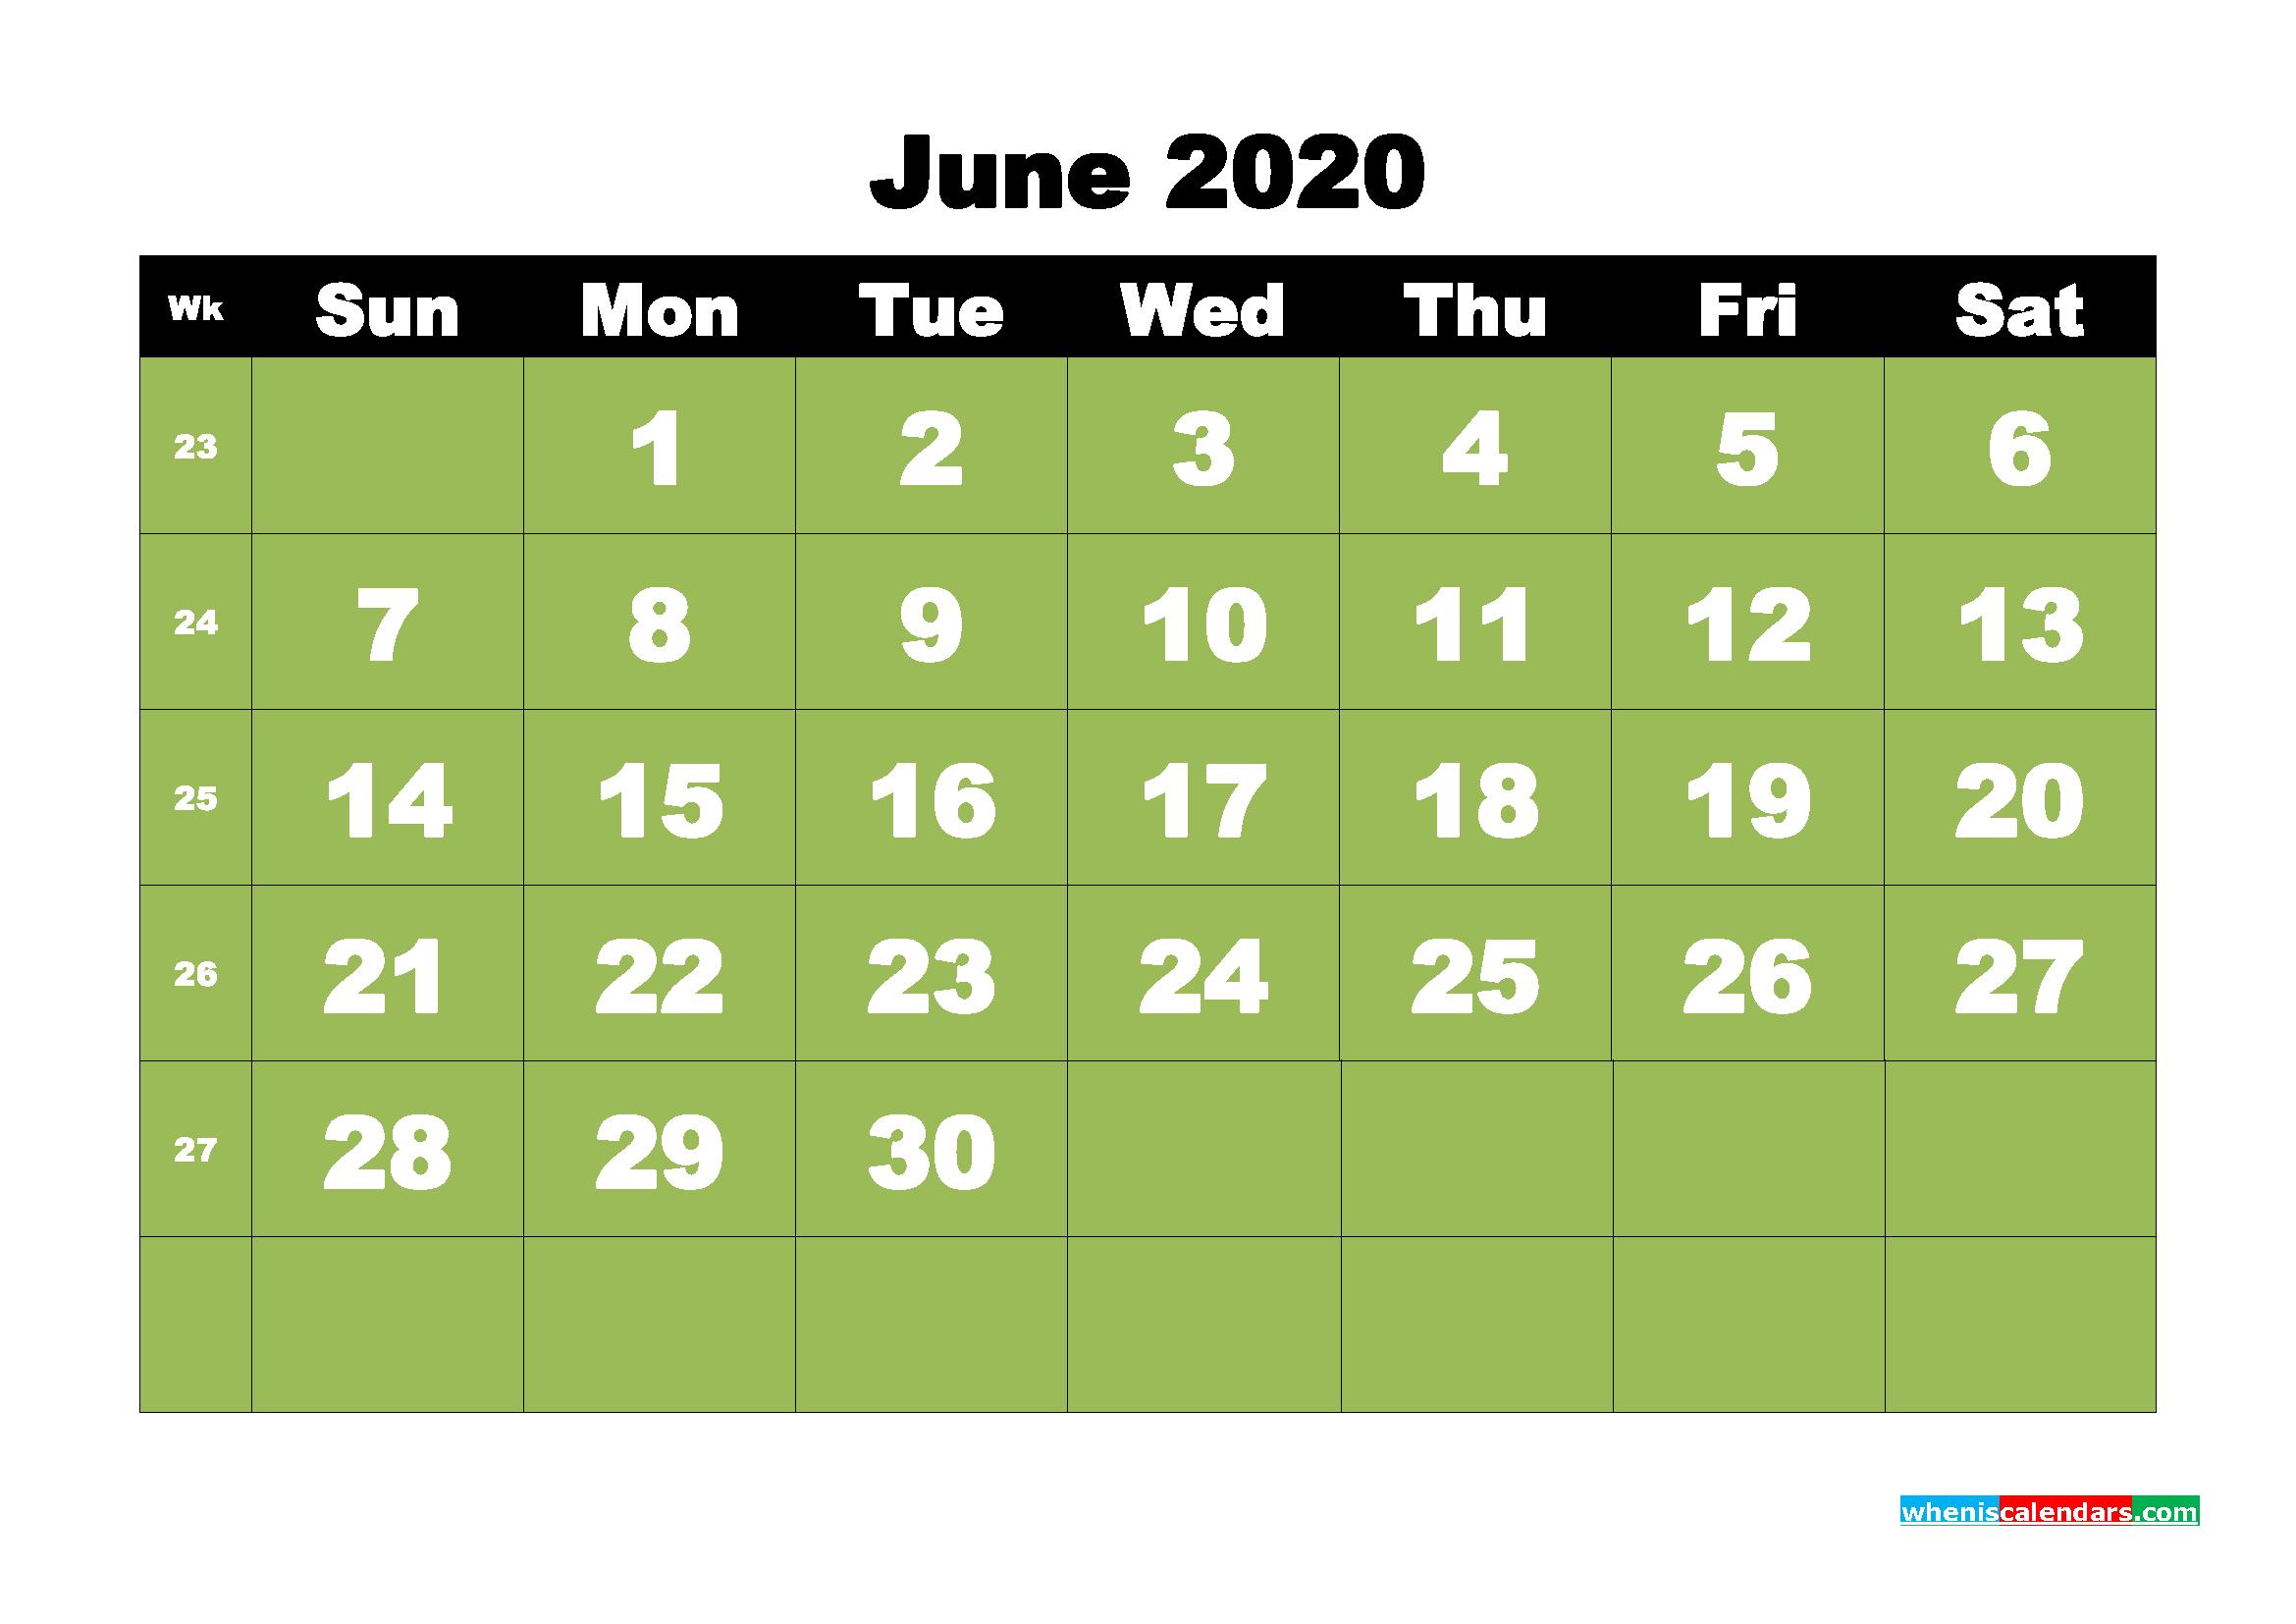 Free Printable June 2020 Calendar - No.m20b30